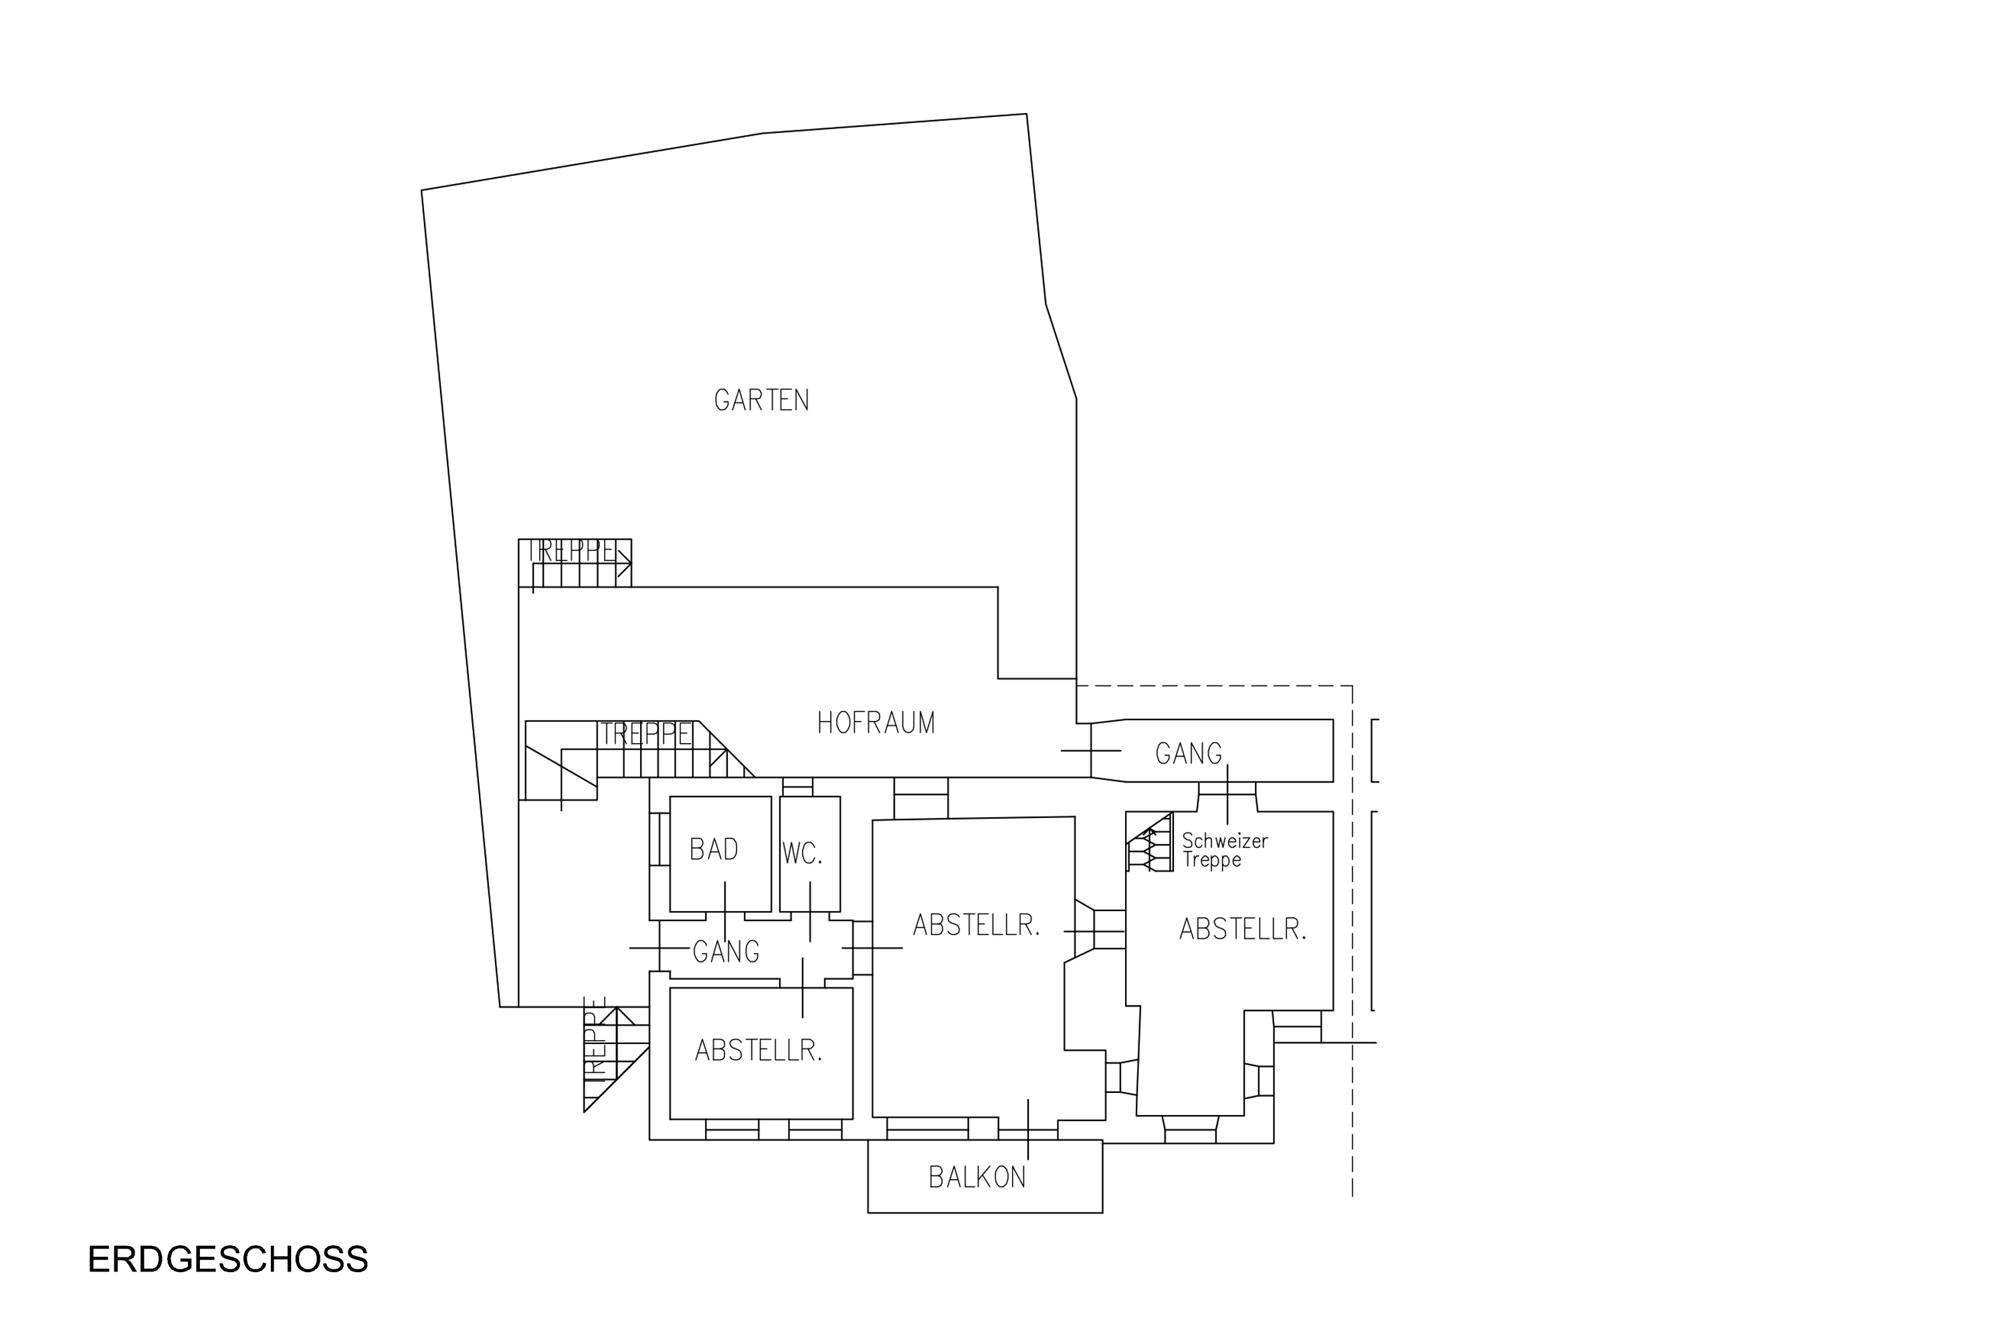 Erdgeschoss - piano terra